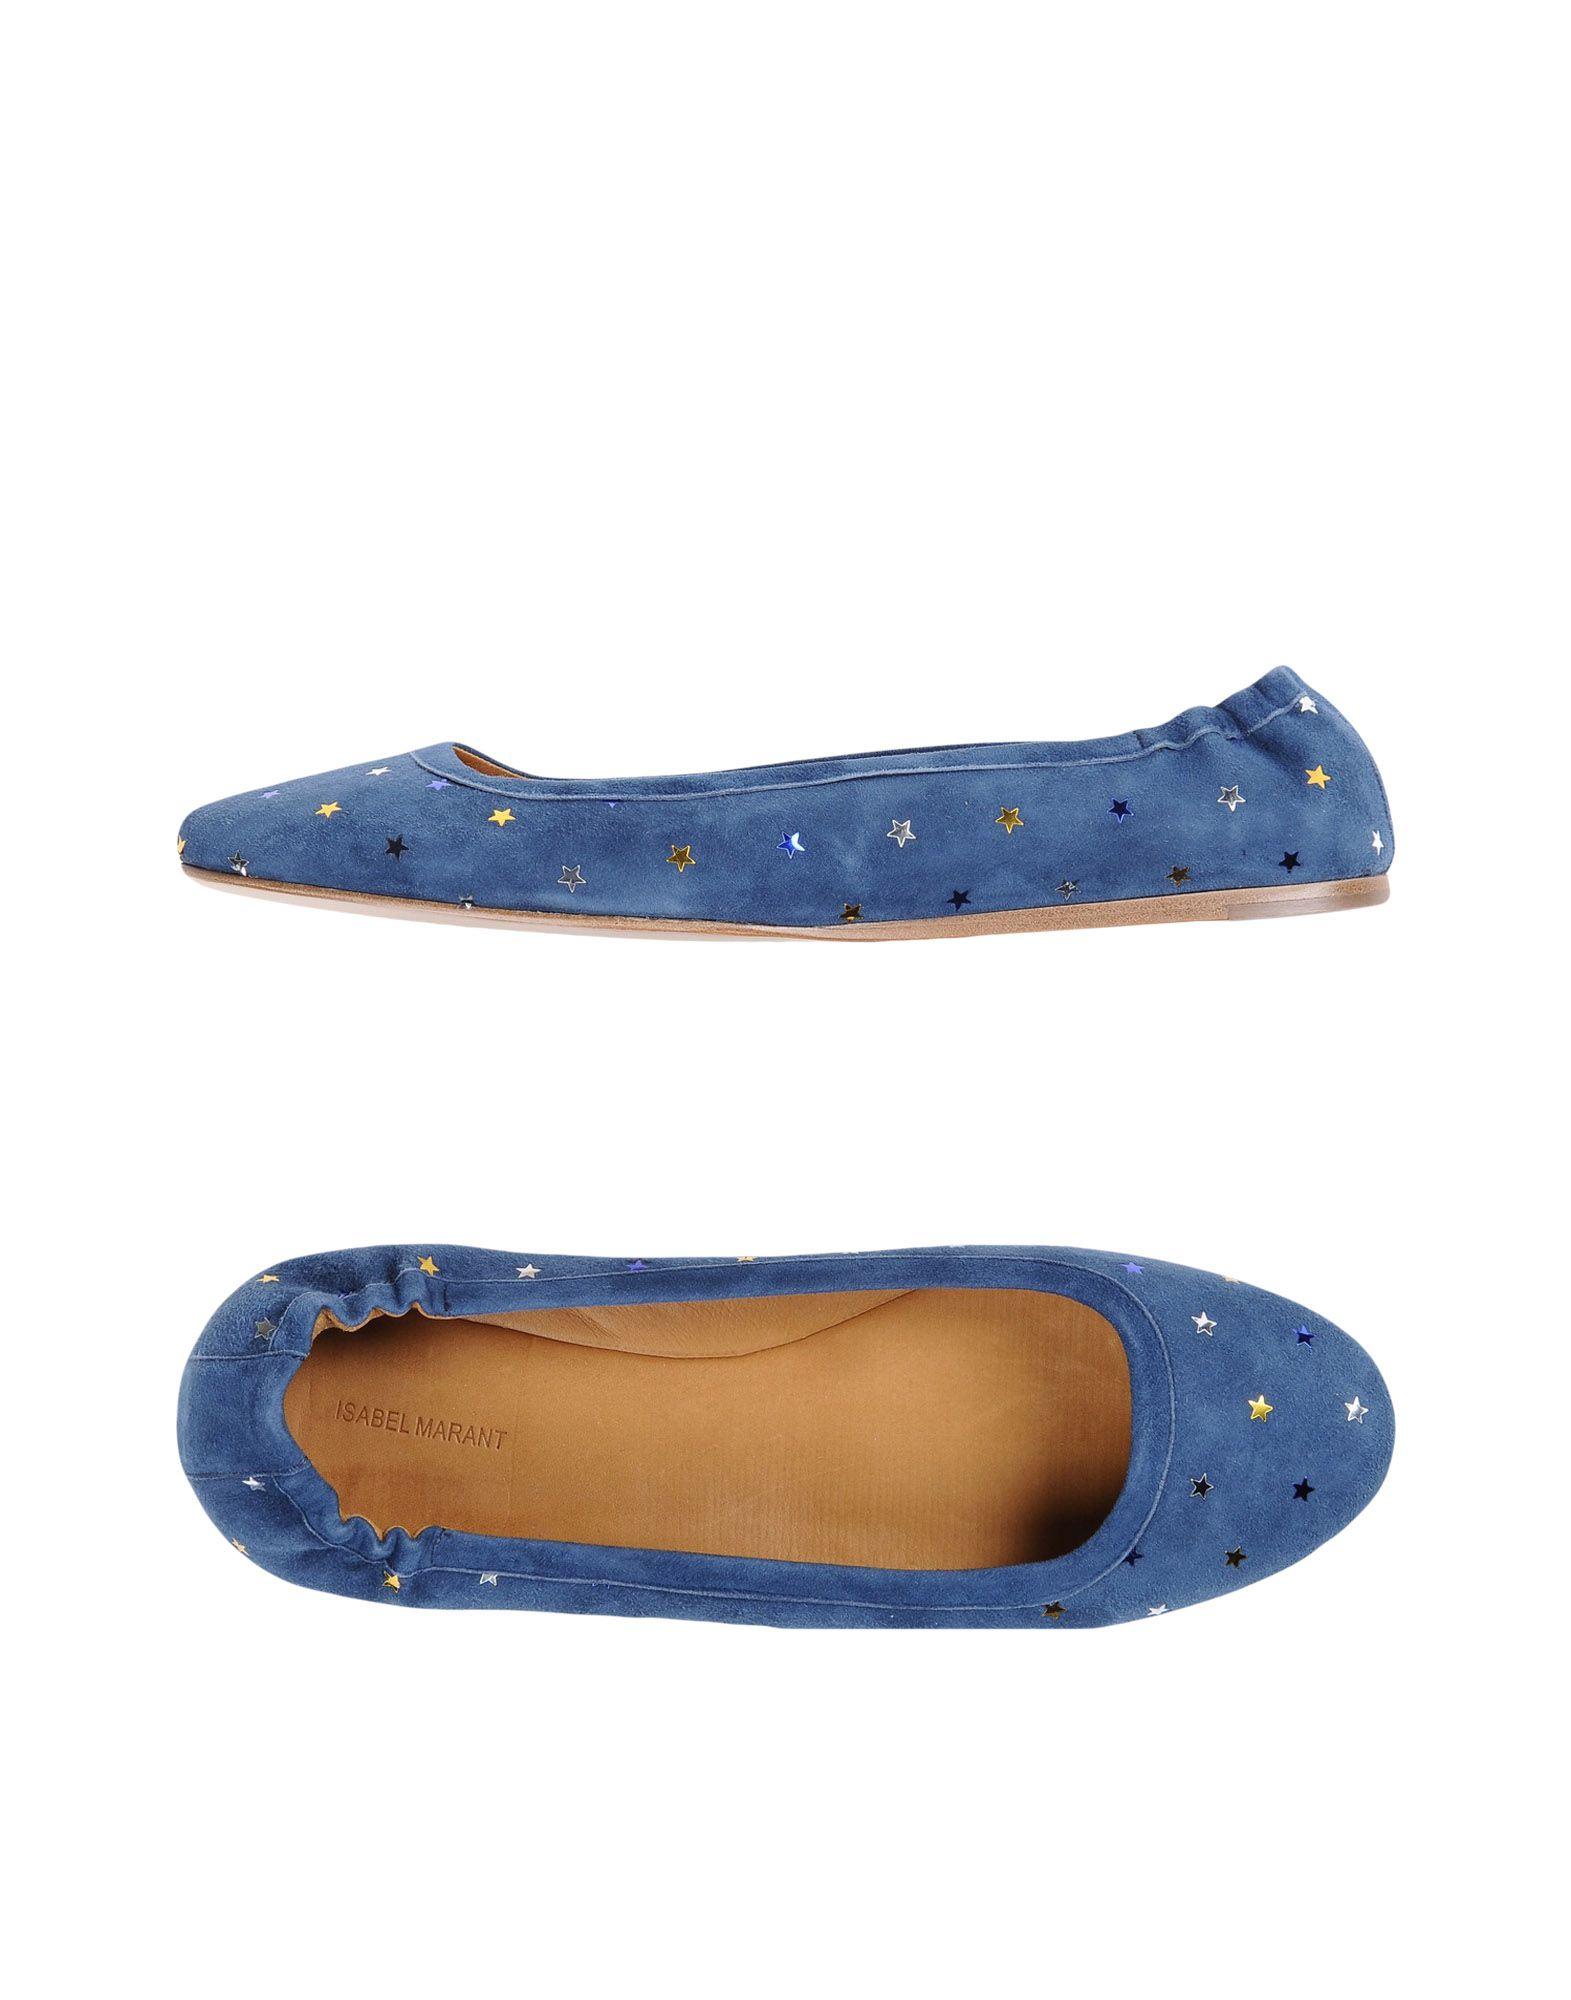 Stilvolle billige Schuhe Isabel 11218473GU Marant Ballerinas Damen  11218473GU Isabel 40ba2b